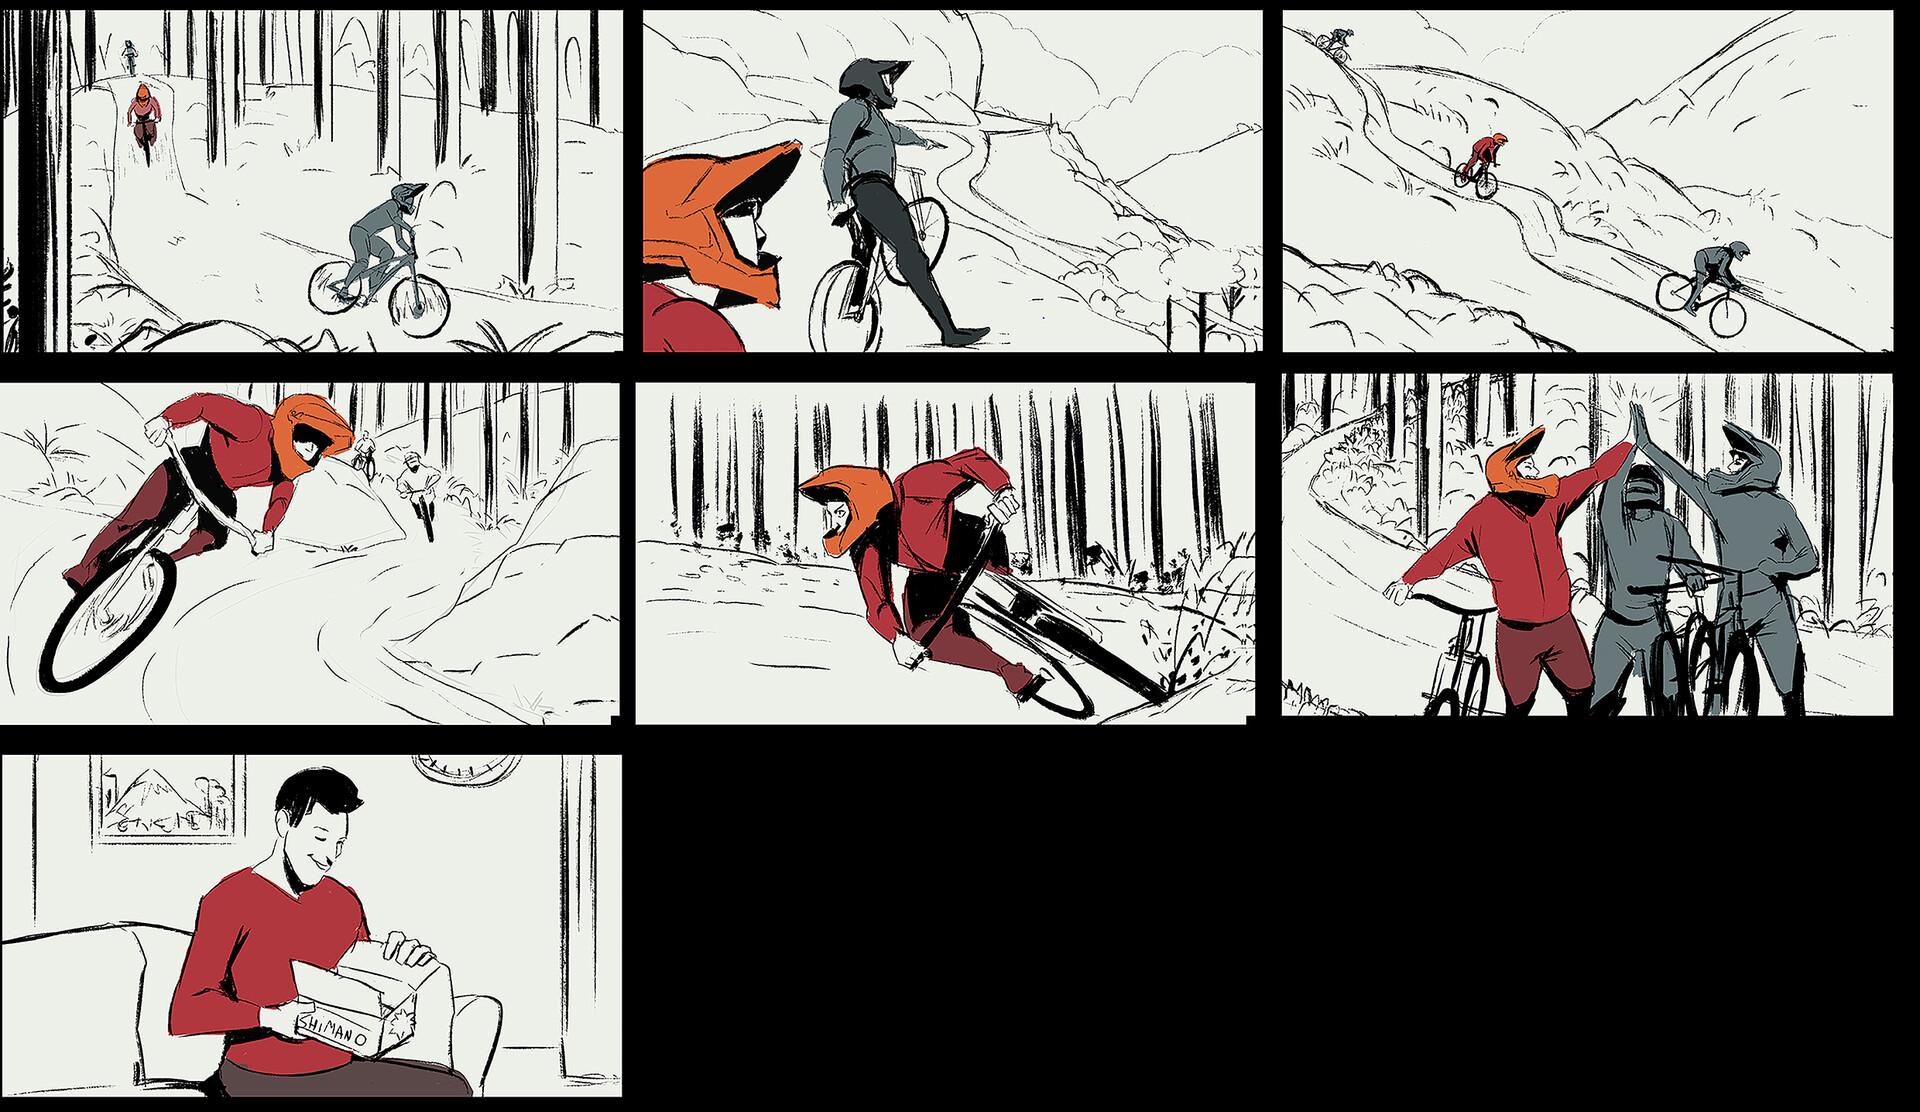 Peter klijn shimano comic 2